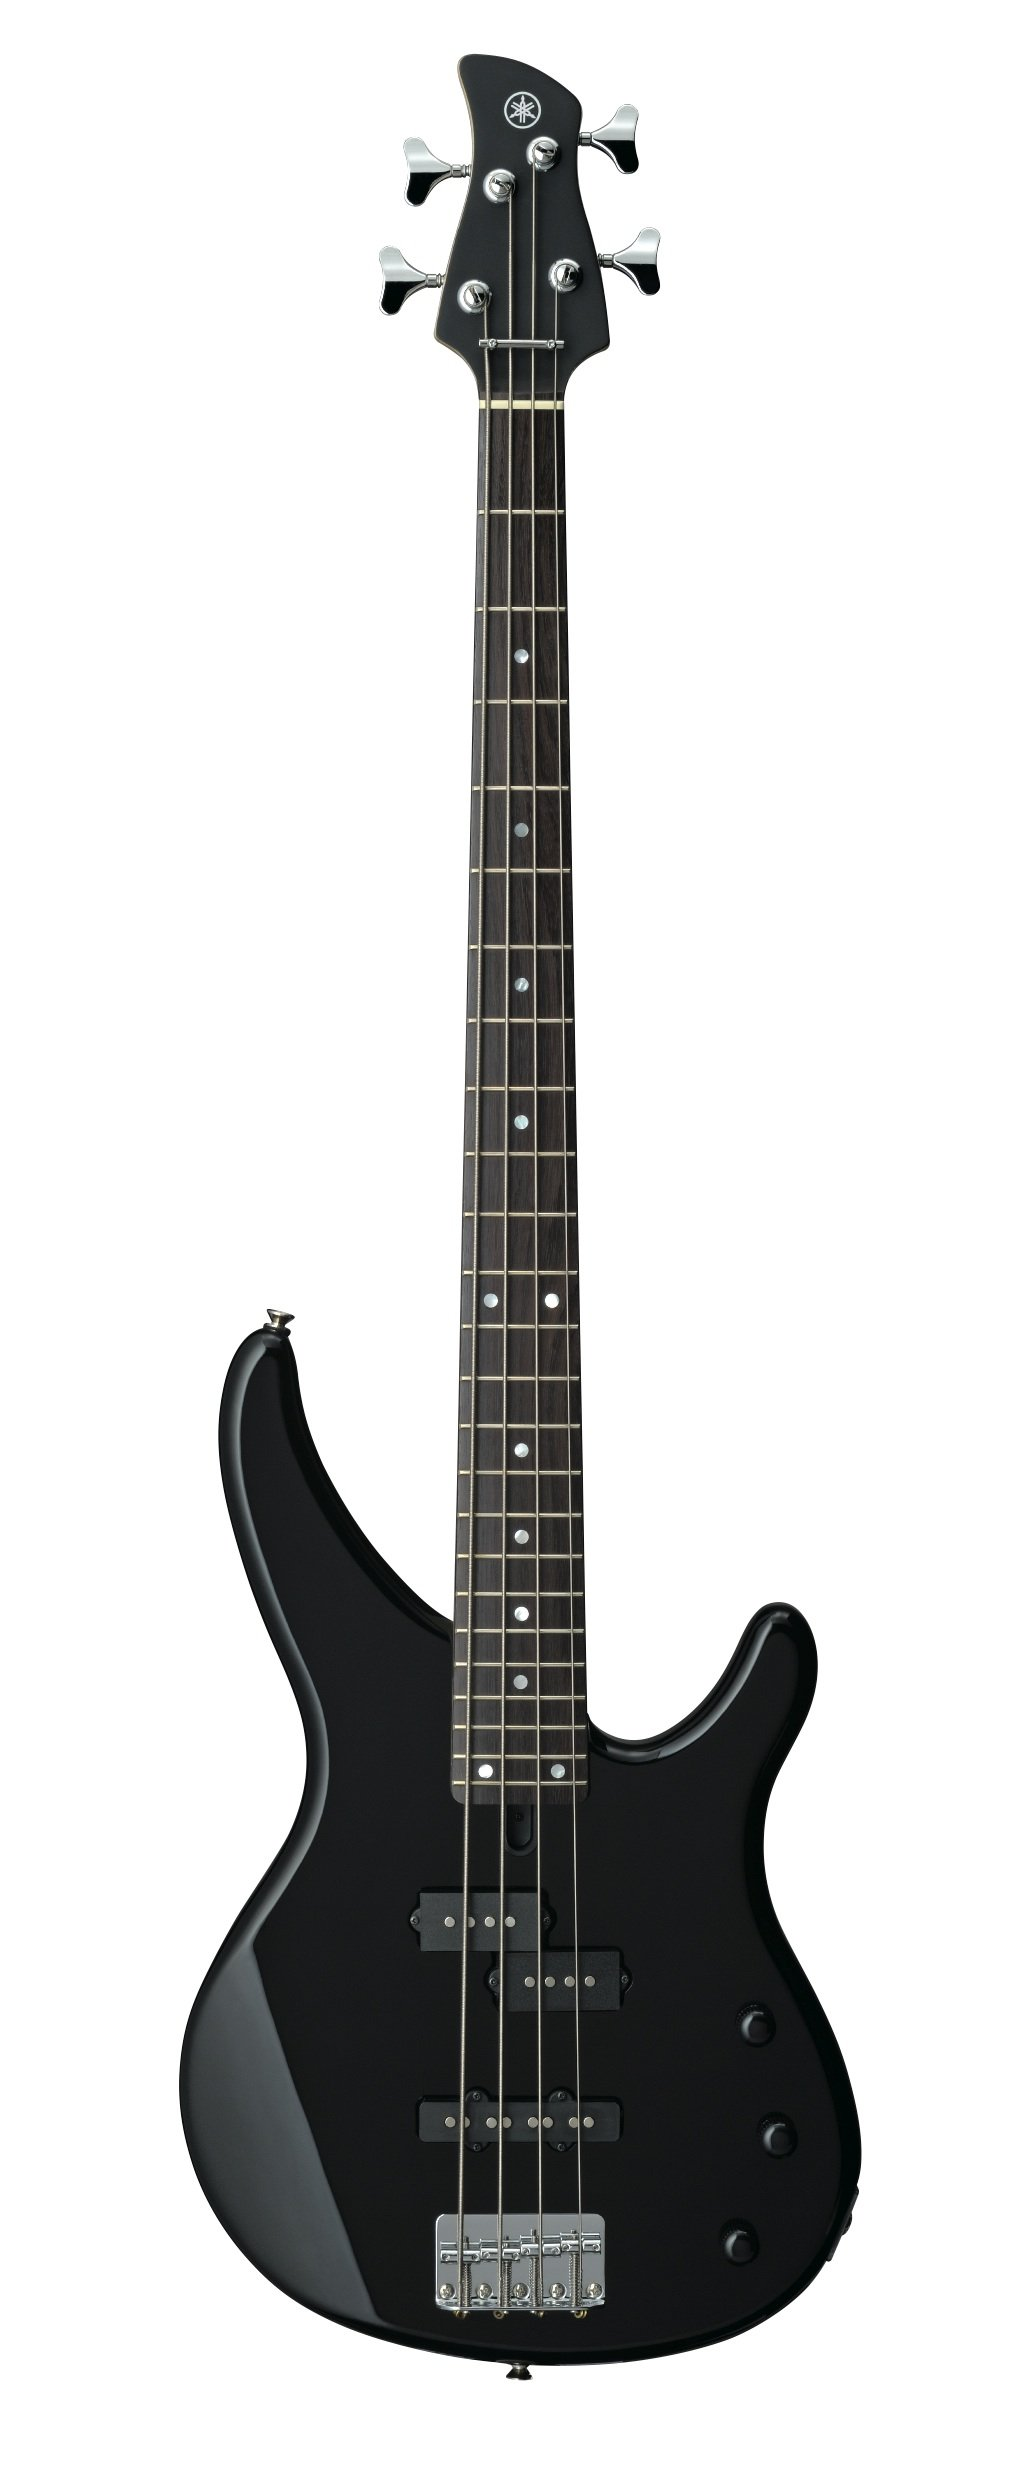 Yamaha 4-String Bass Guitar Right Handed, Black 4-String TRBX174 BL